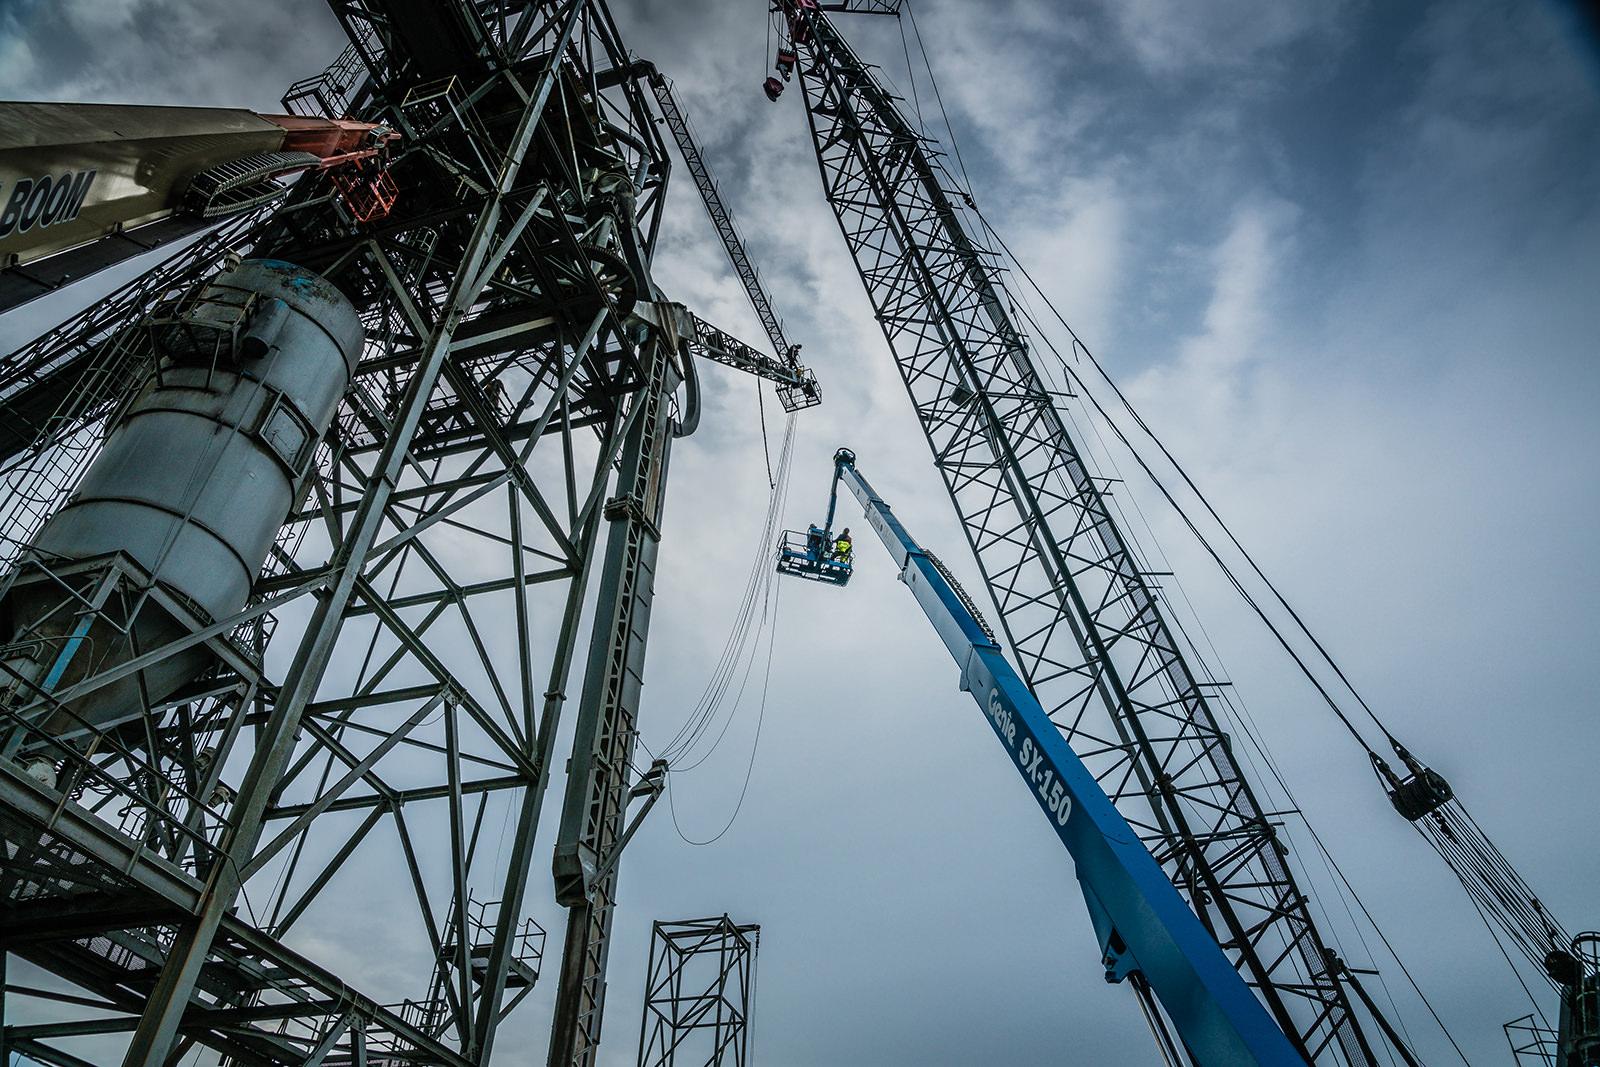 crane and crew doing emergency granary waterside dock repair